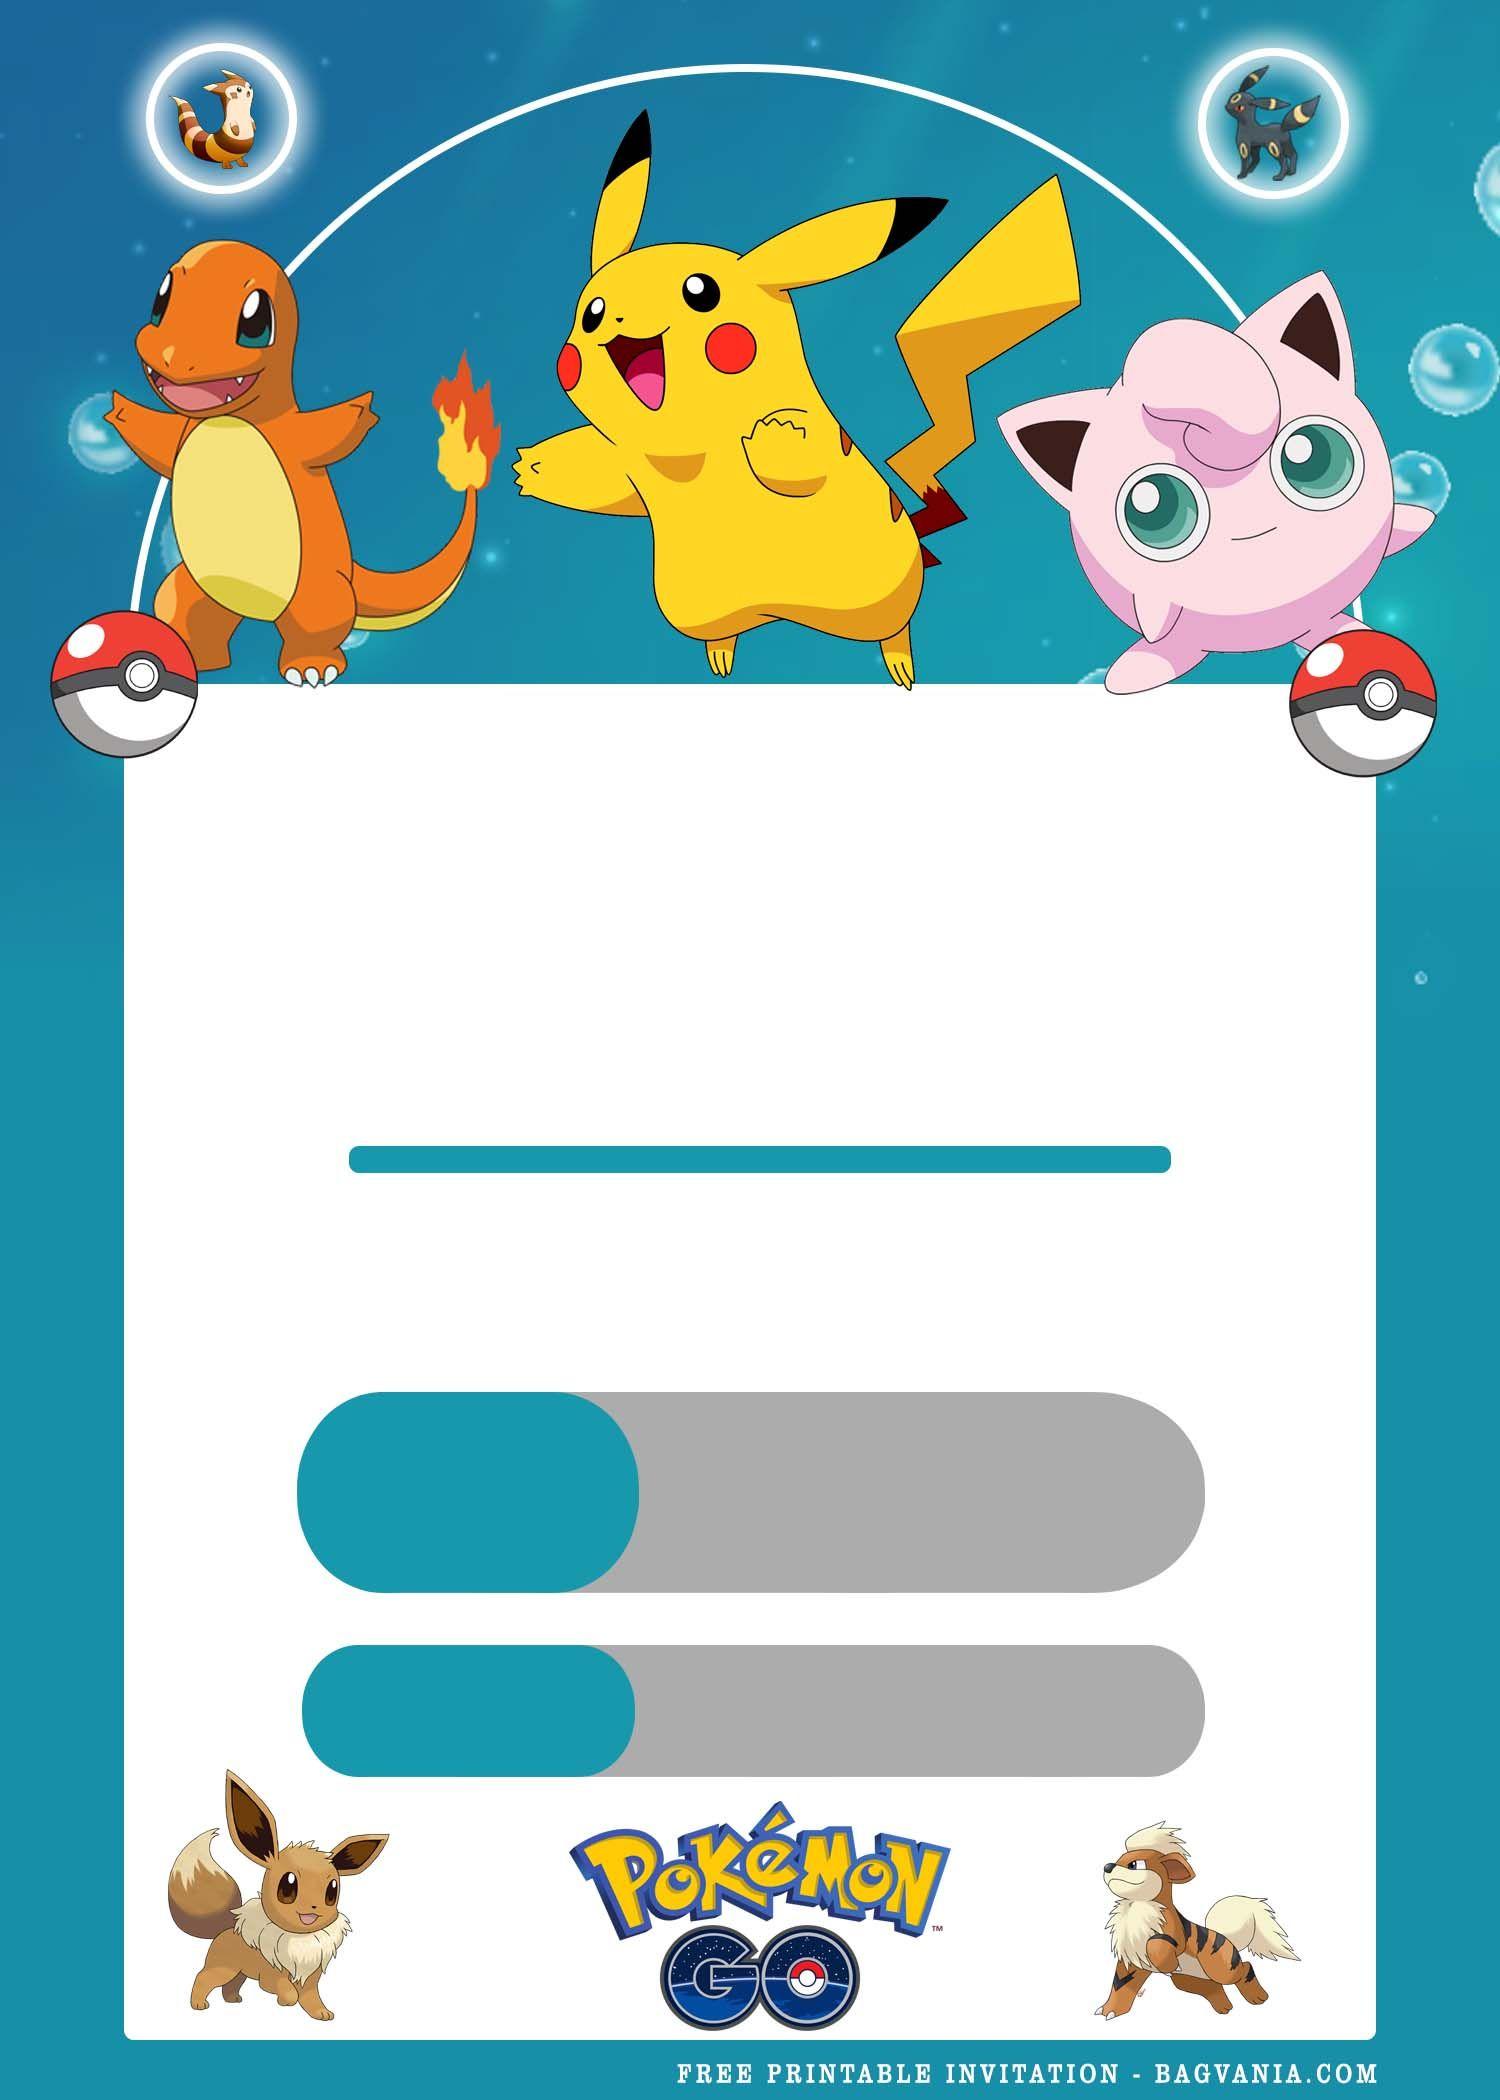 Free Printable Pokemon Birthday Invitation Templates Pokemon Birthday Birthday Invitation Templates Printable Birthday Invitations